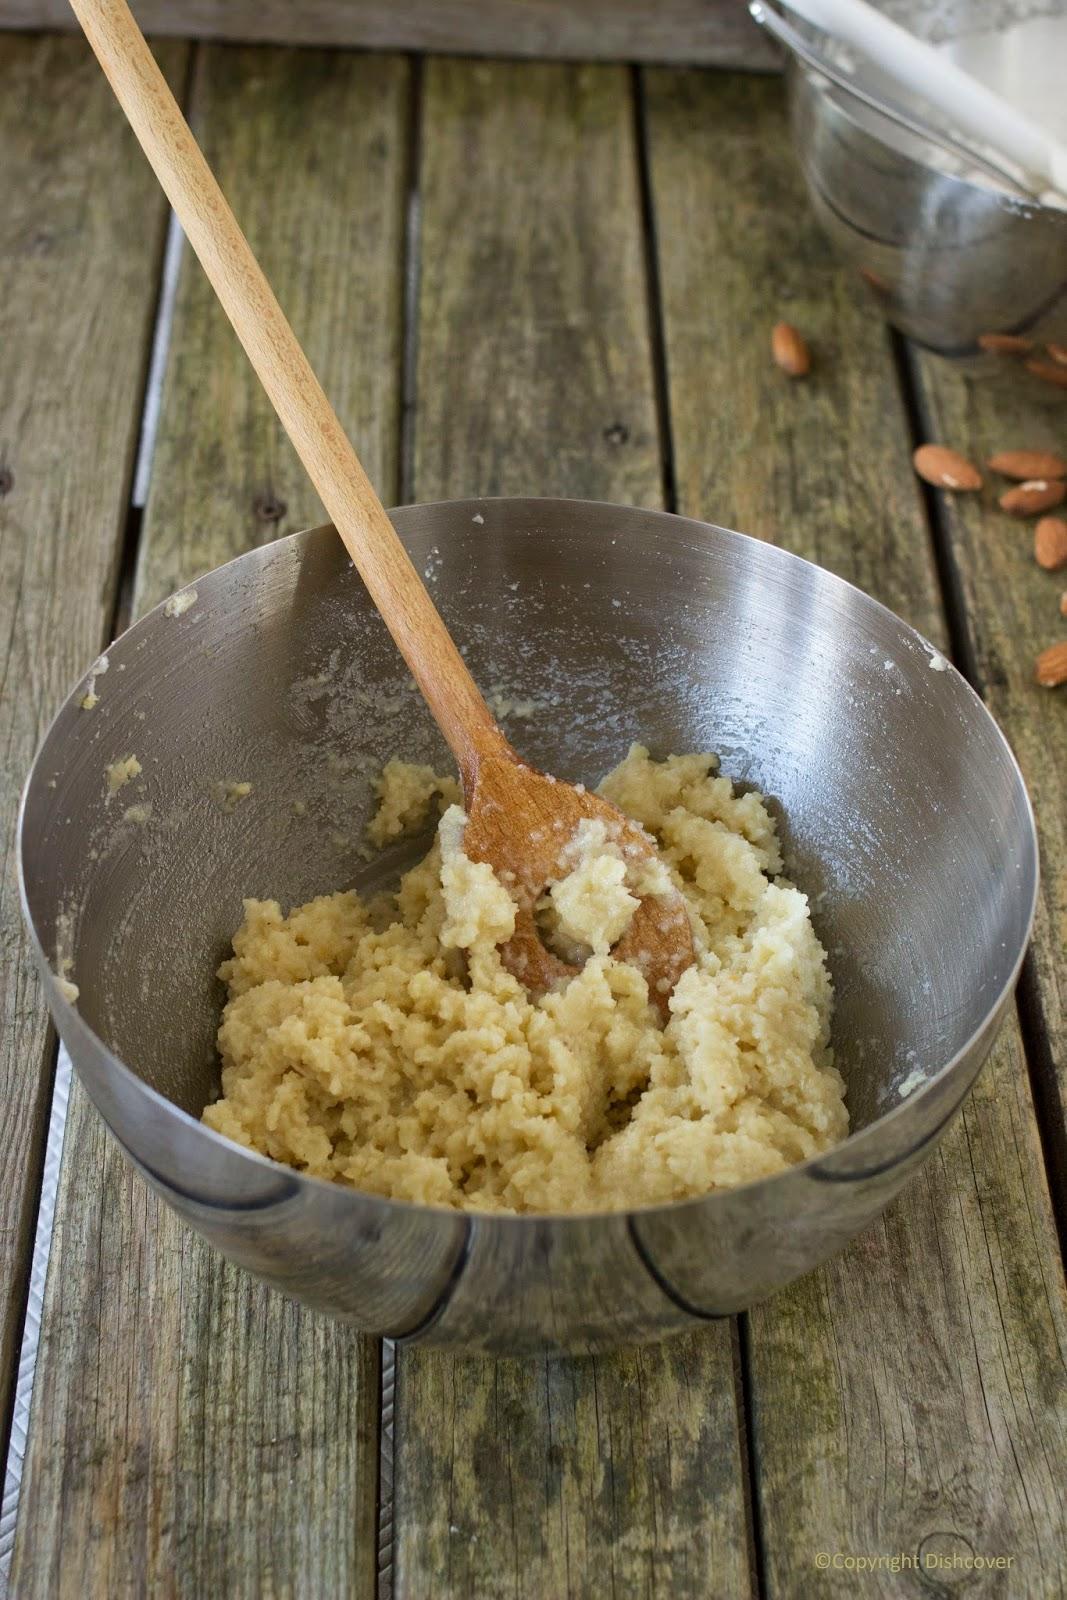 koekjes bakken zonder boter